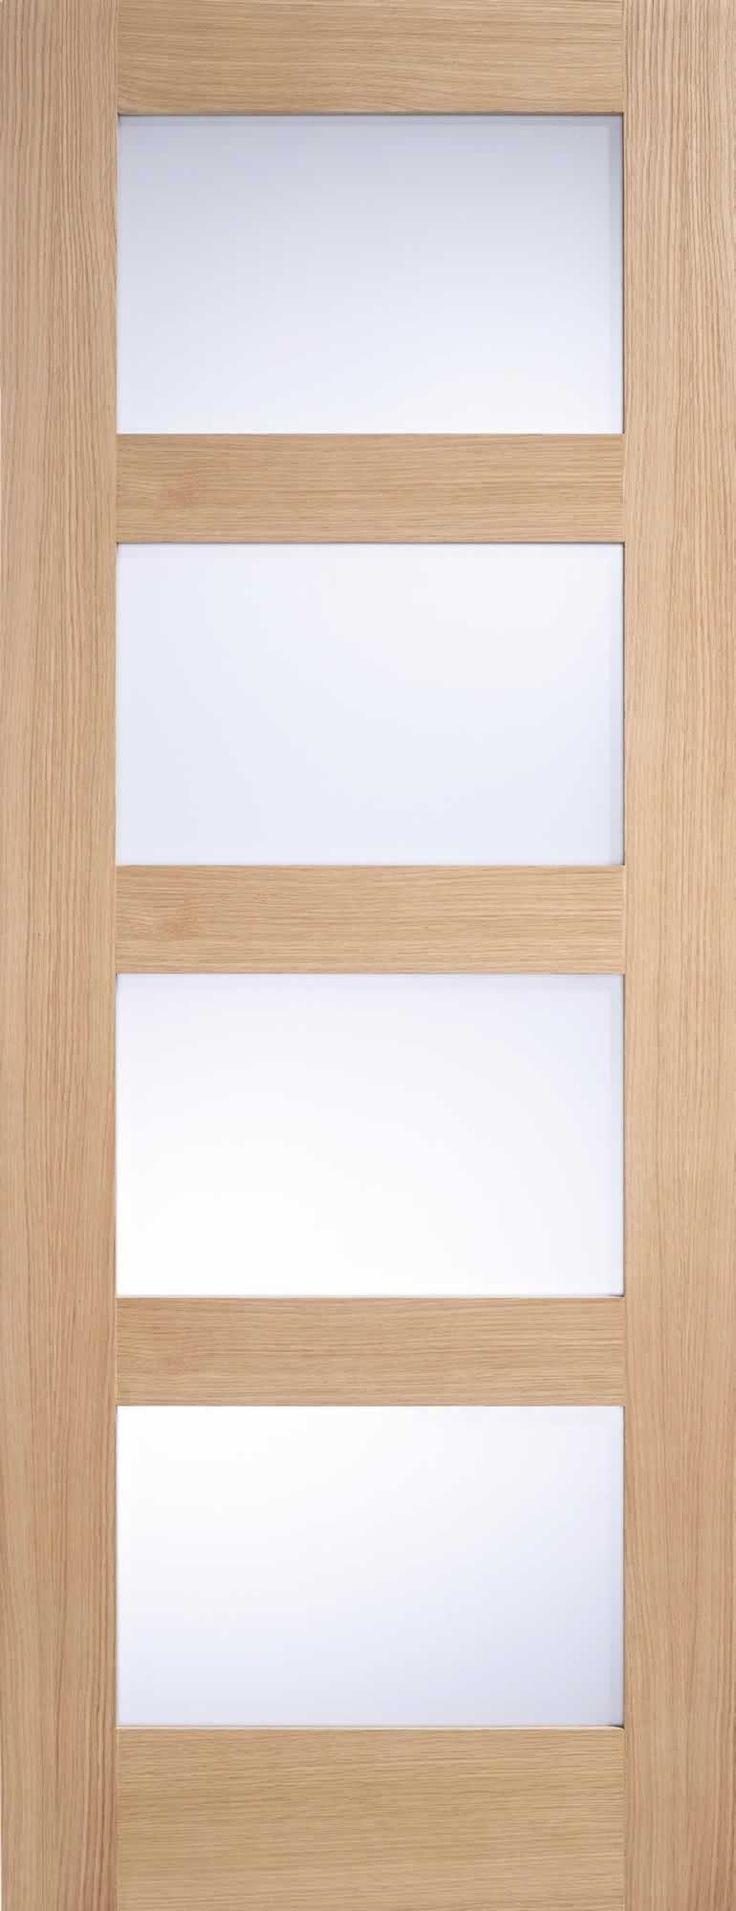 best 25 internal glazed doors ideas on pinterest glass. Black Bedroom Furniture Sets. Home Design Ideas